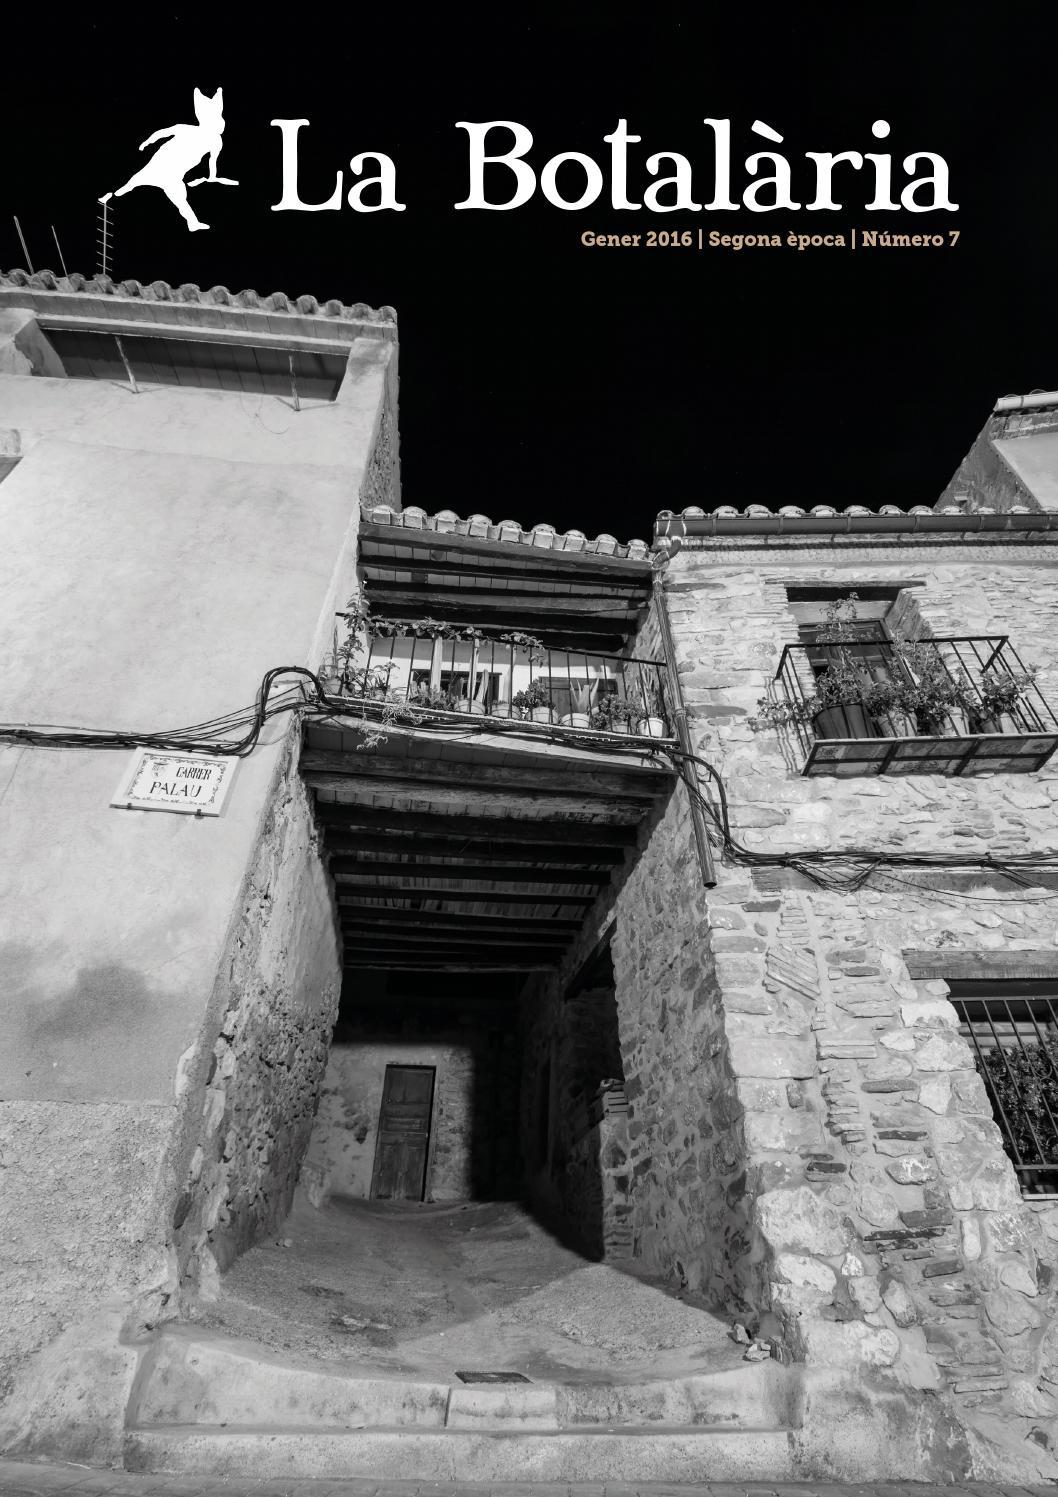 Muebles Pitarch Borriol - La Botal Ria N Mero 7 2016 By Associaci Cultural La Botal Ria [mjhdah]https://image.isu.pub/150409203737-fd8eda26d50b27d68b34cf42443a6e9d/jpg/page_1.jpg